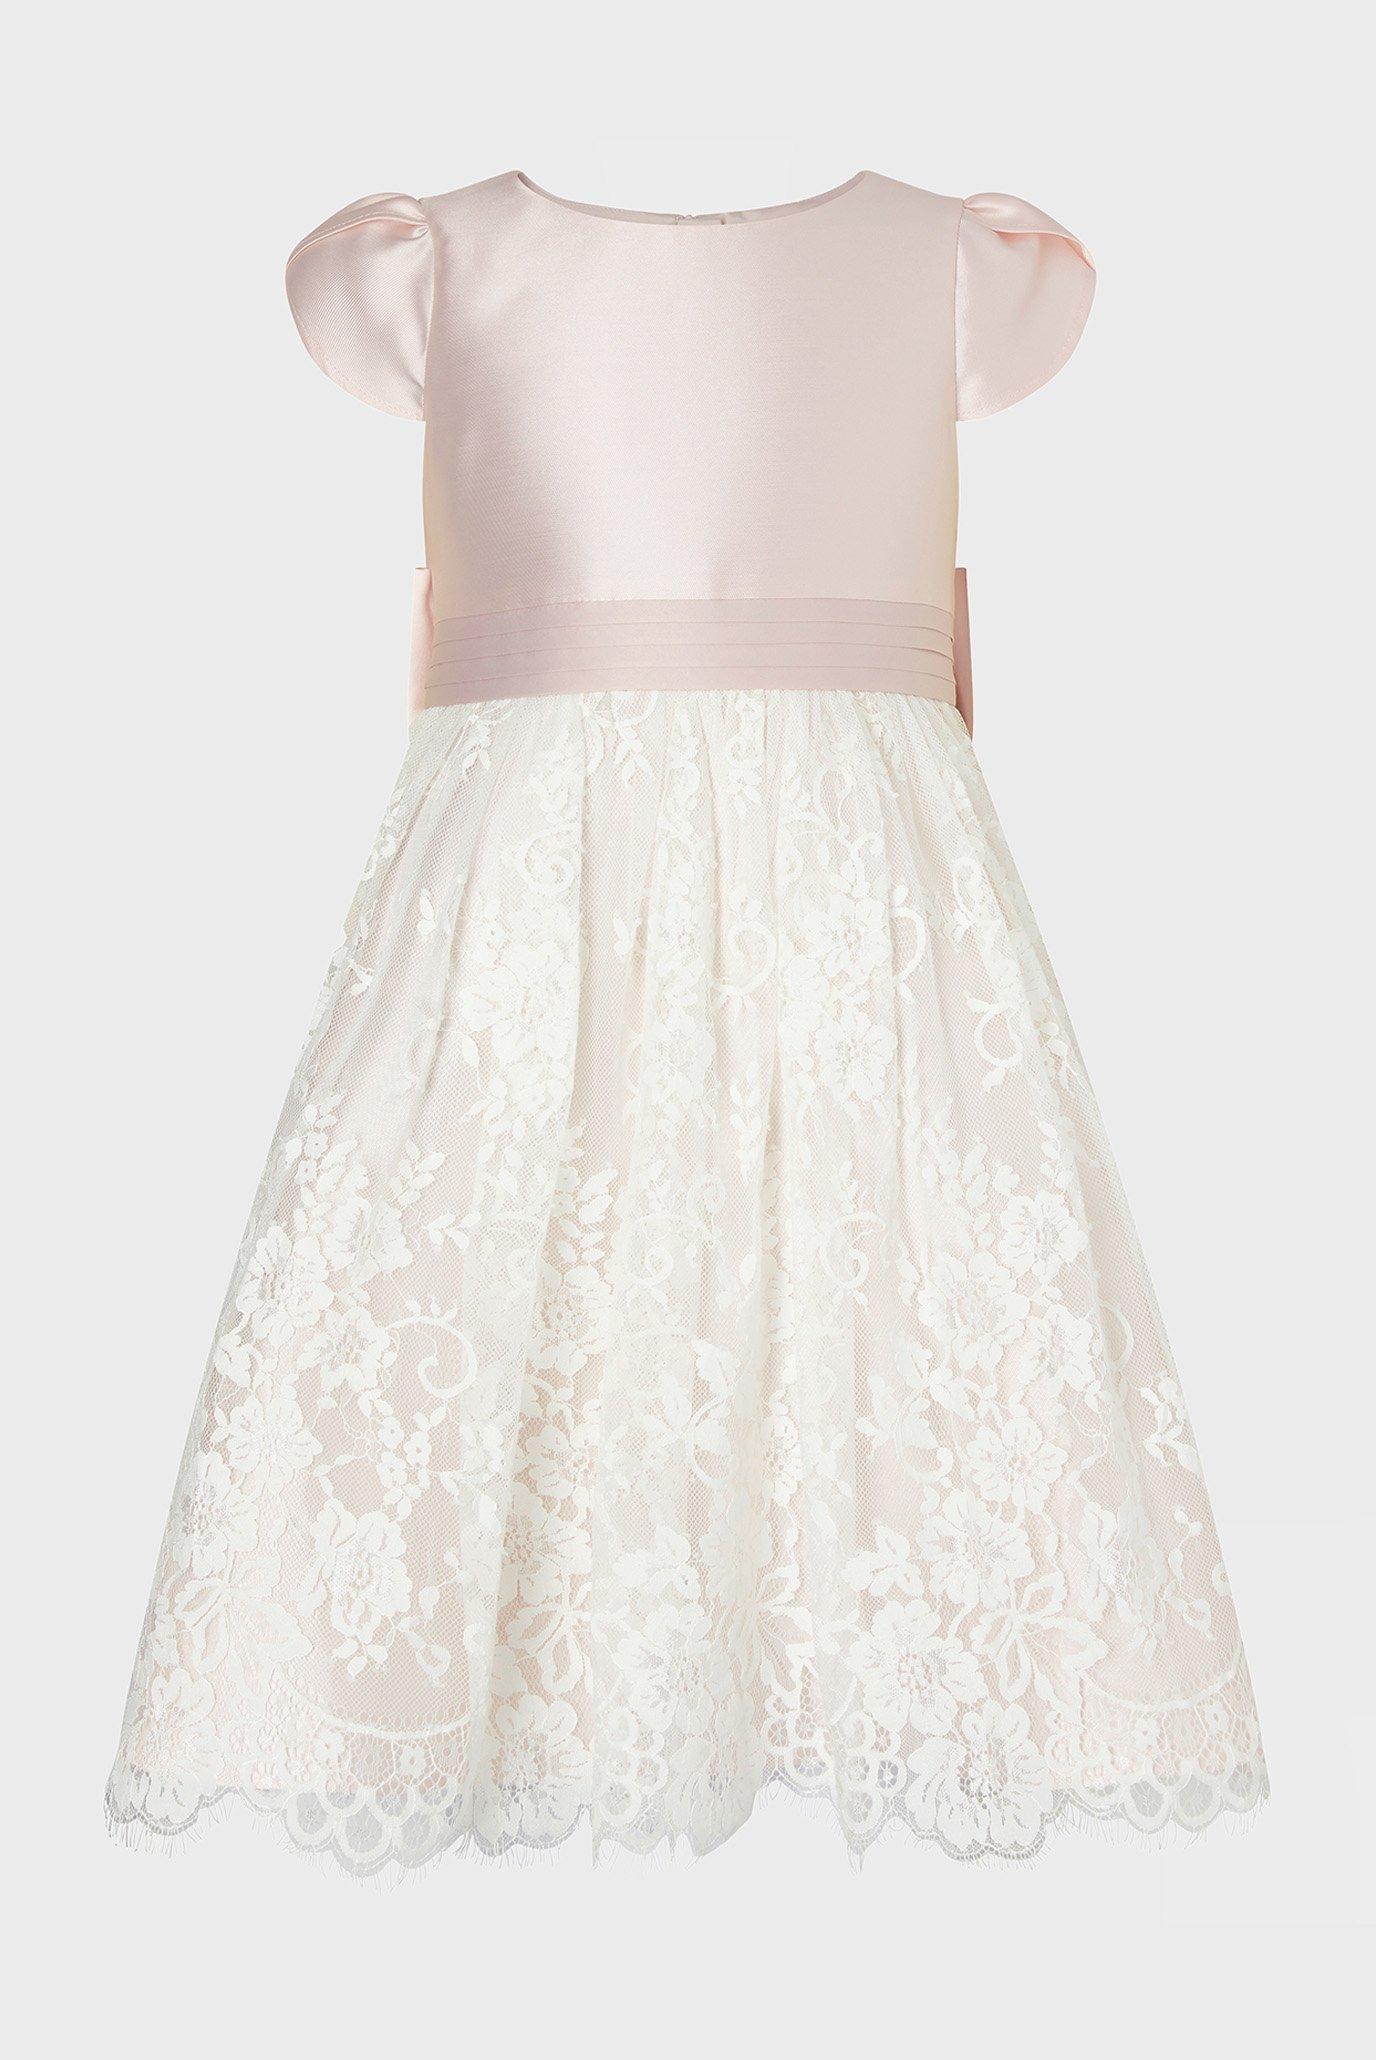 Дитяча сукня PINK LACE BRIDESMAID 1